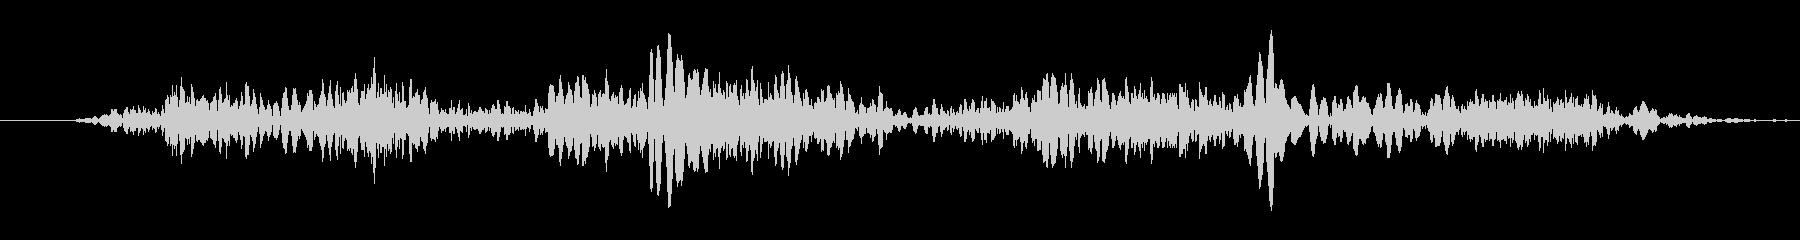 DJスクラッチビニールレコードの未再生の波形